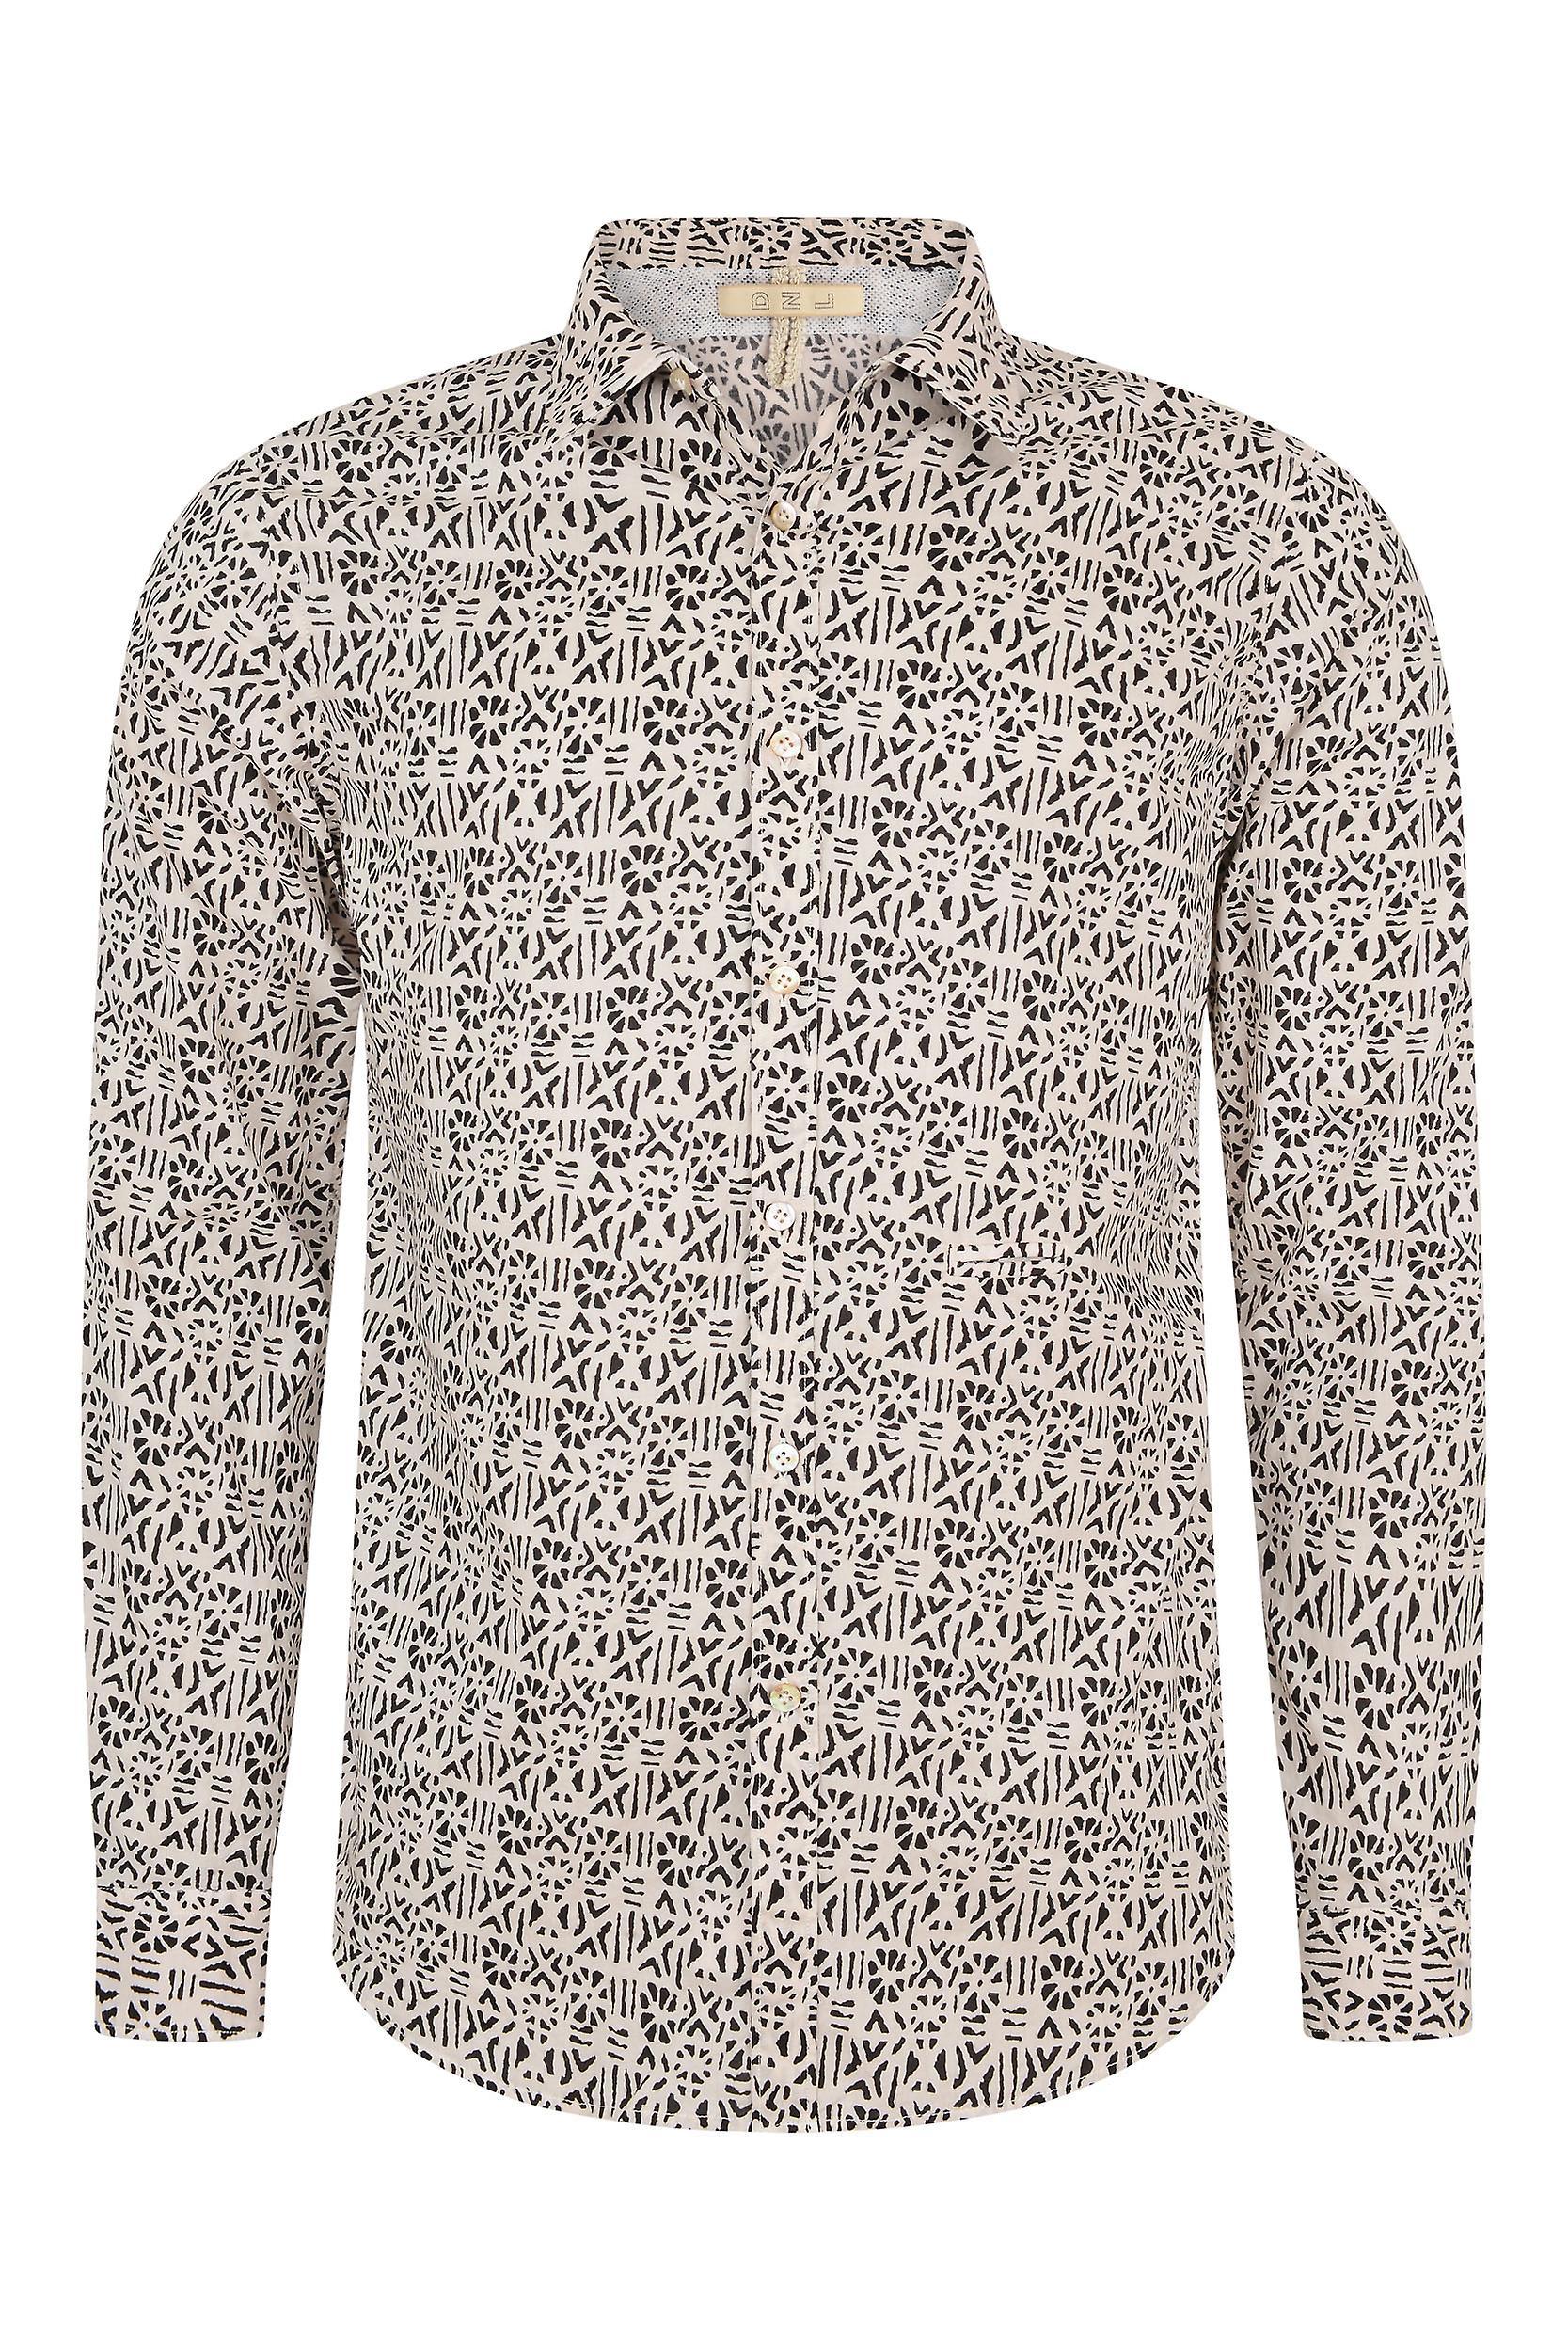 Fabio Giovanni Salentina Shirt - Mens Italian Casual Stylish Shirt 100% Cotton - Long Sleeve